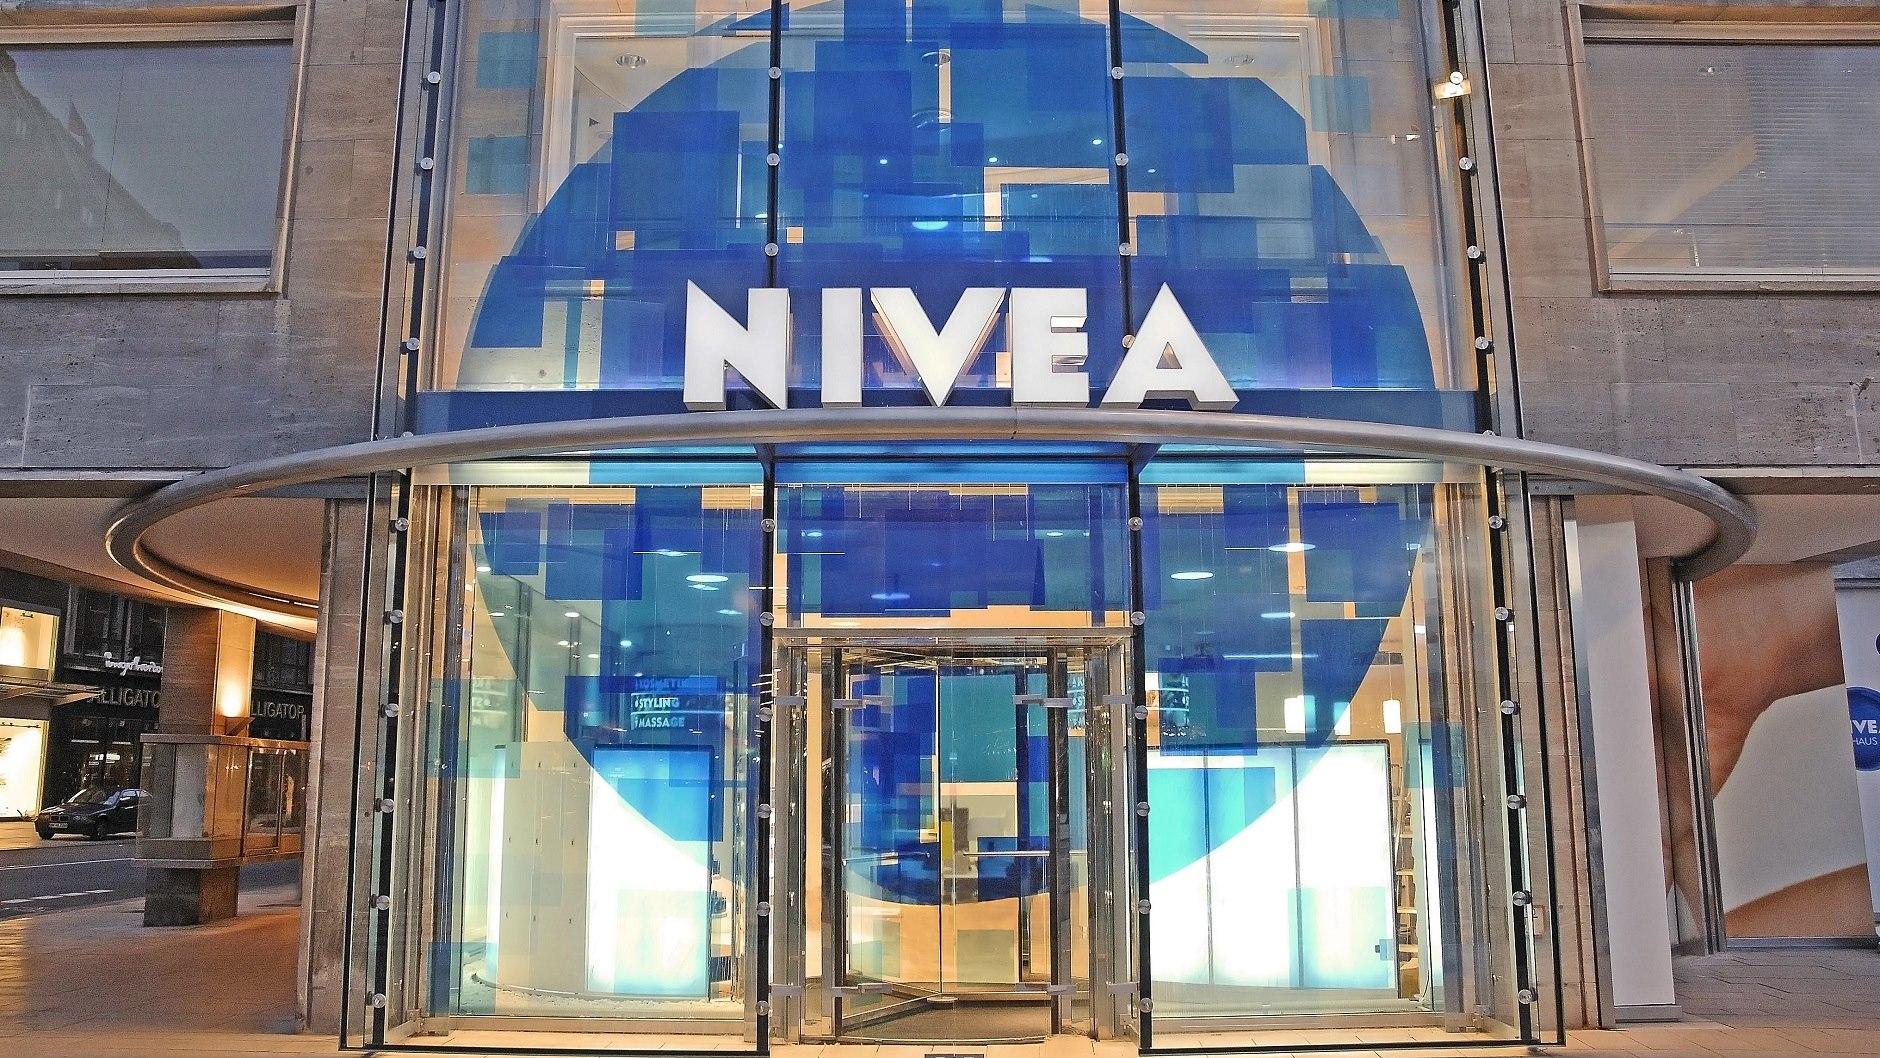 Beiersdorf Nivea Haus Feiert Jubilaum